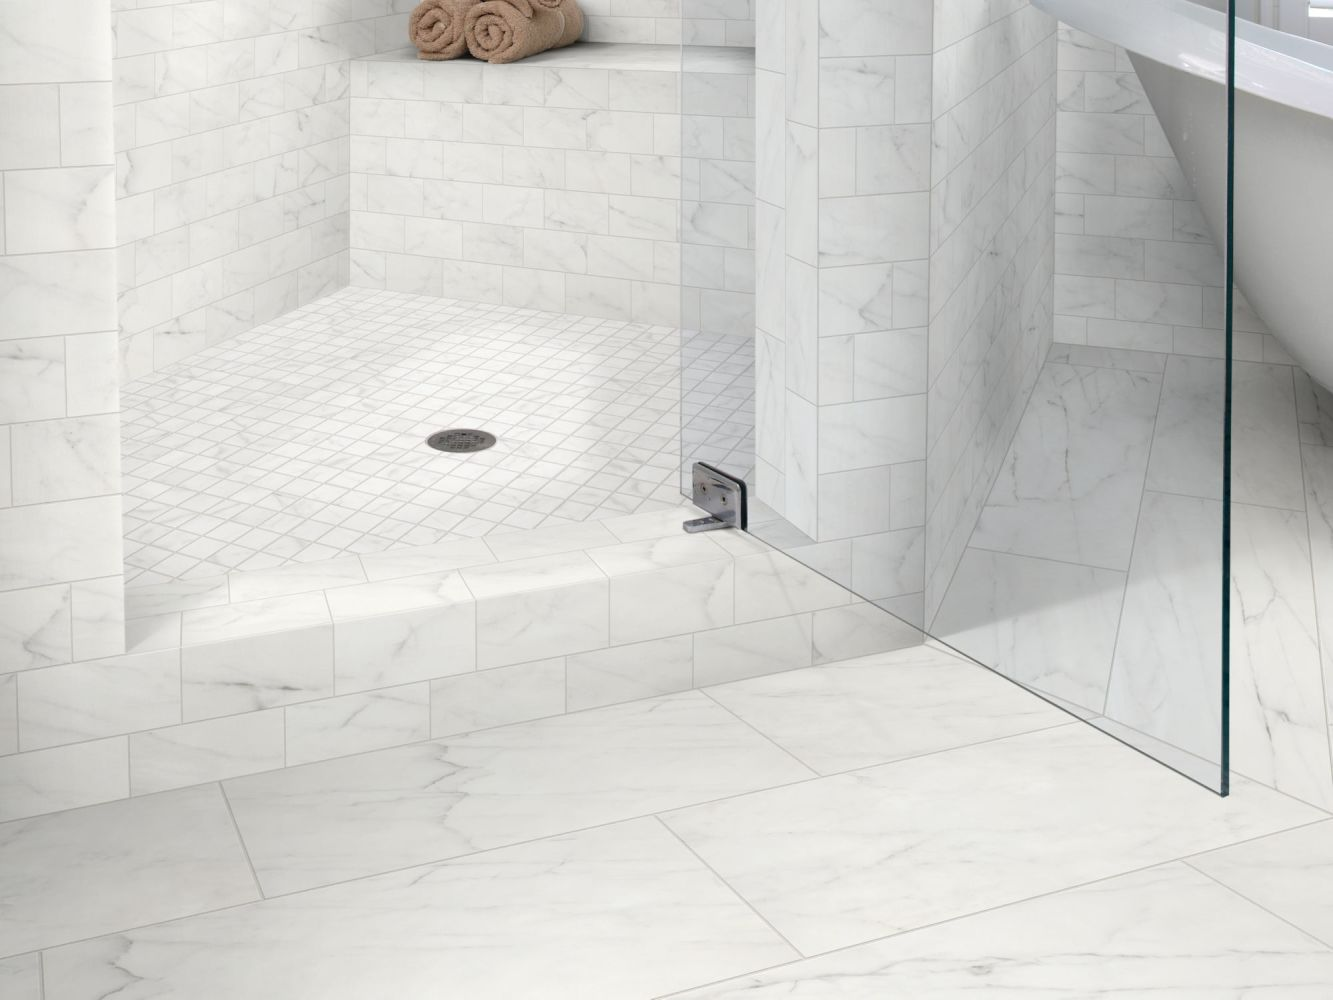 Shaw Floors Home Fn Gold Ceramic Caracalla Sbn Carrara 00150_TGM48